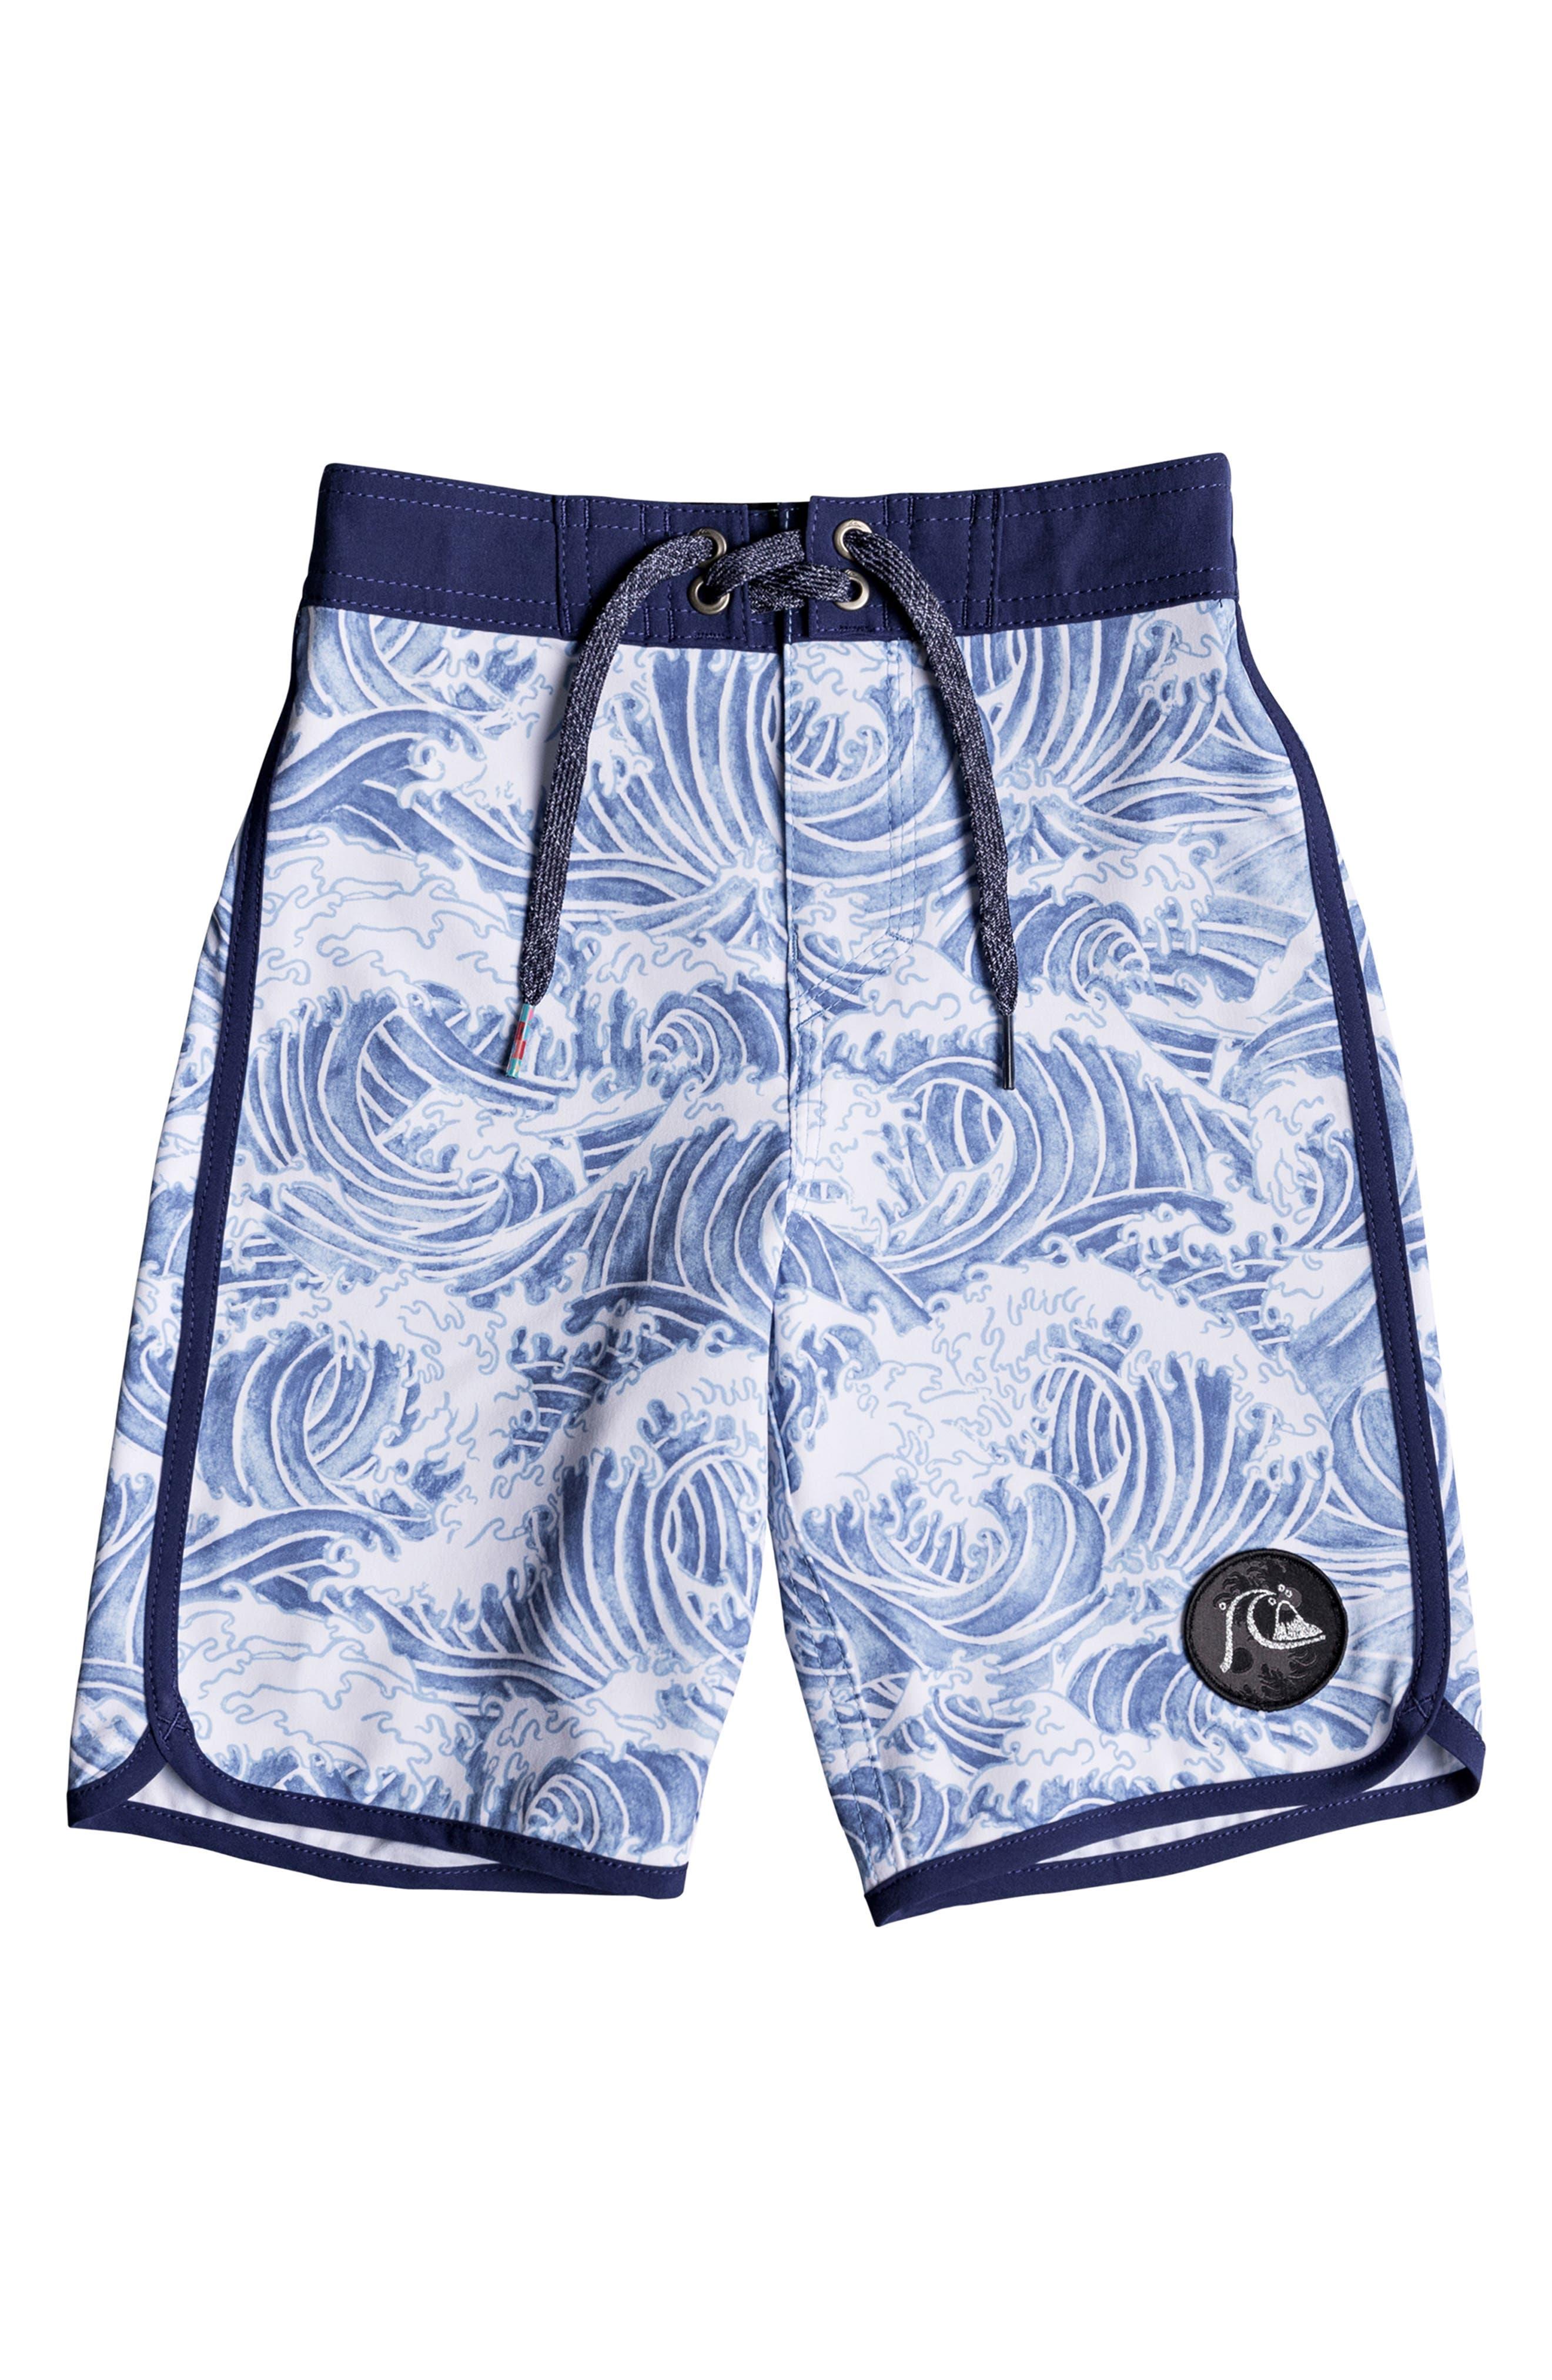 Toddler Boys Quiksilver Highline Legend Board Shorts Size 3T  Blue